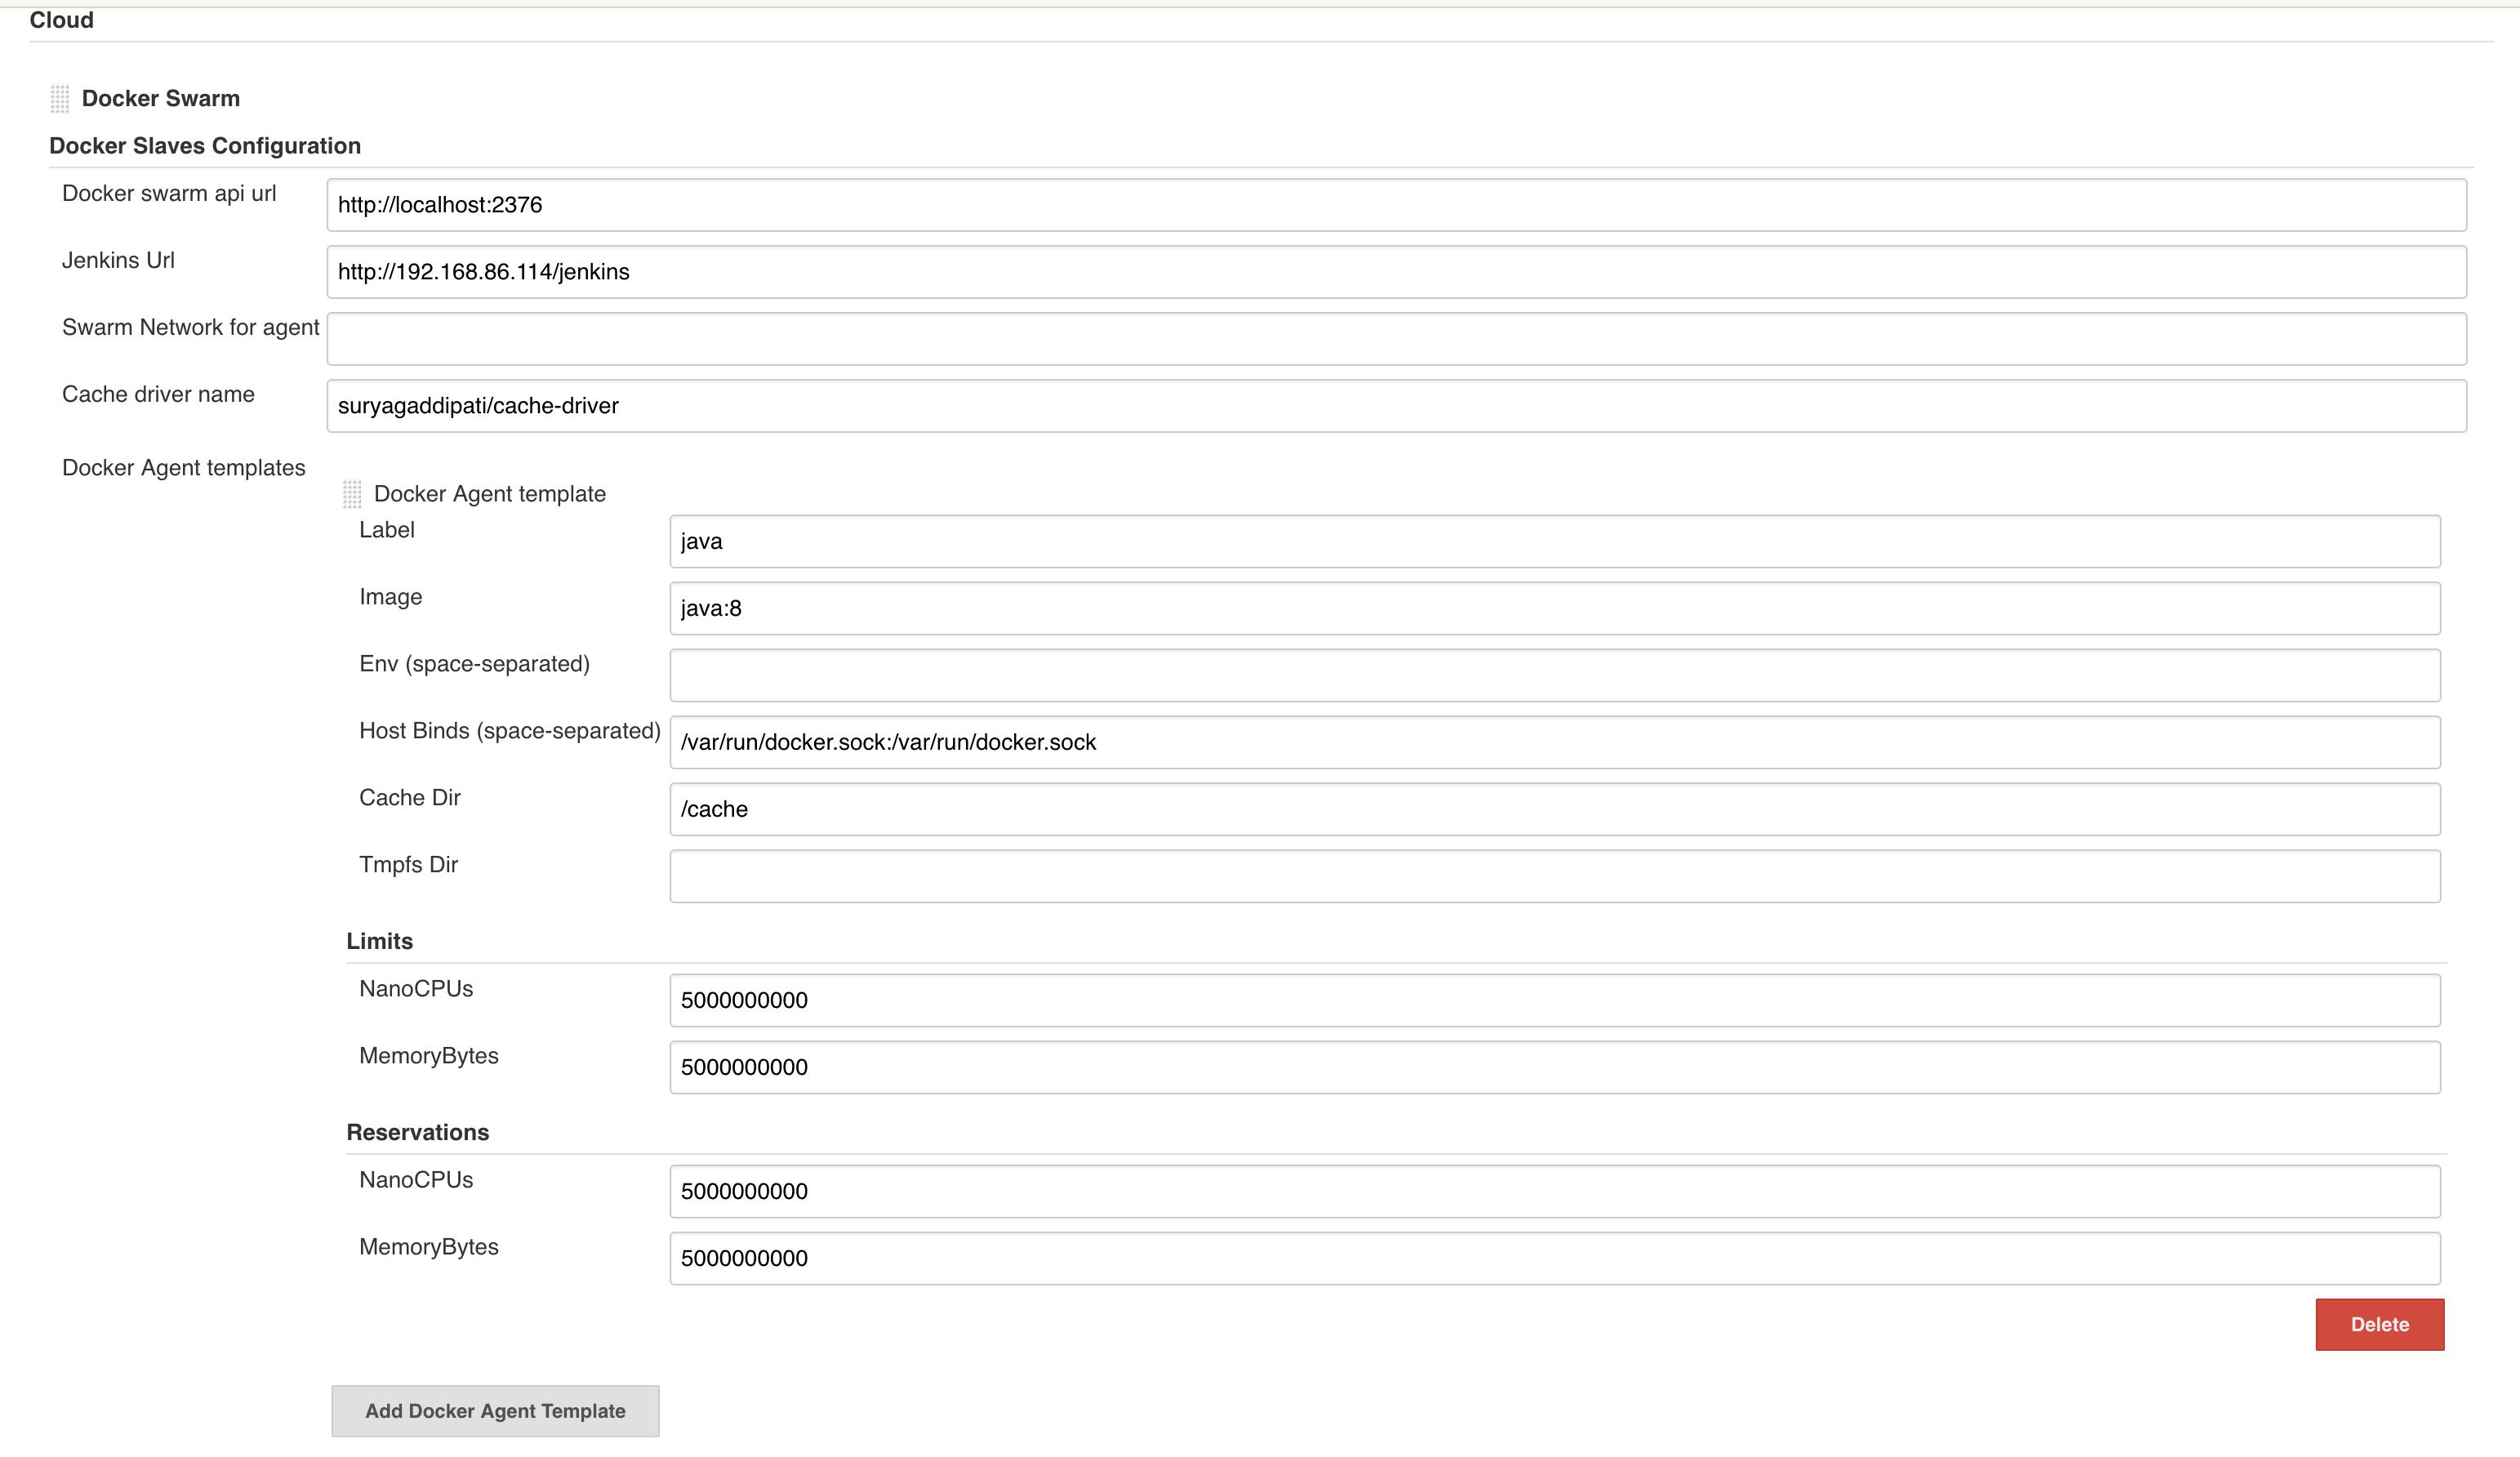 GitHub - suryagaddipati/jenkins-docker-swarm-plugin-deprecated